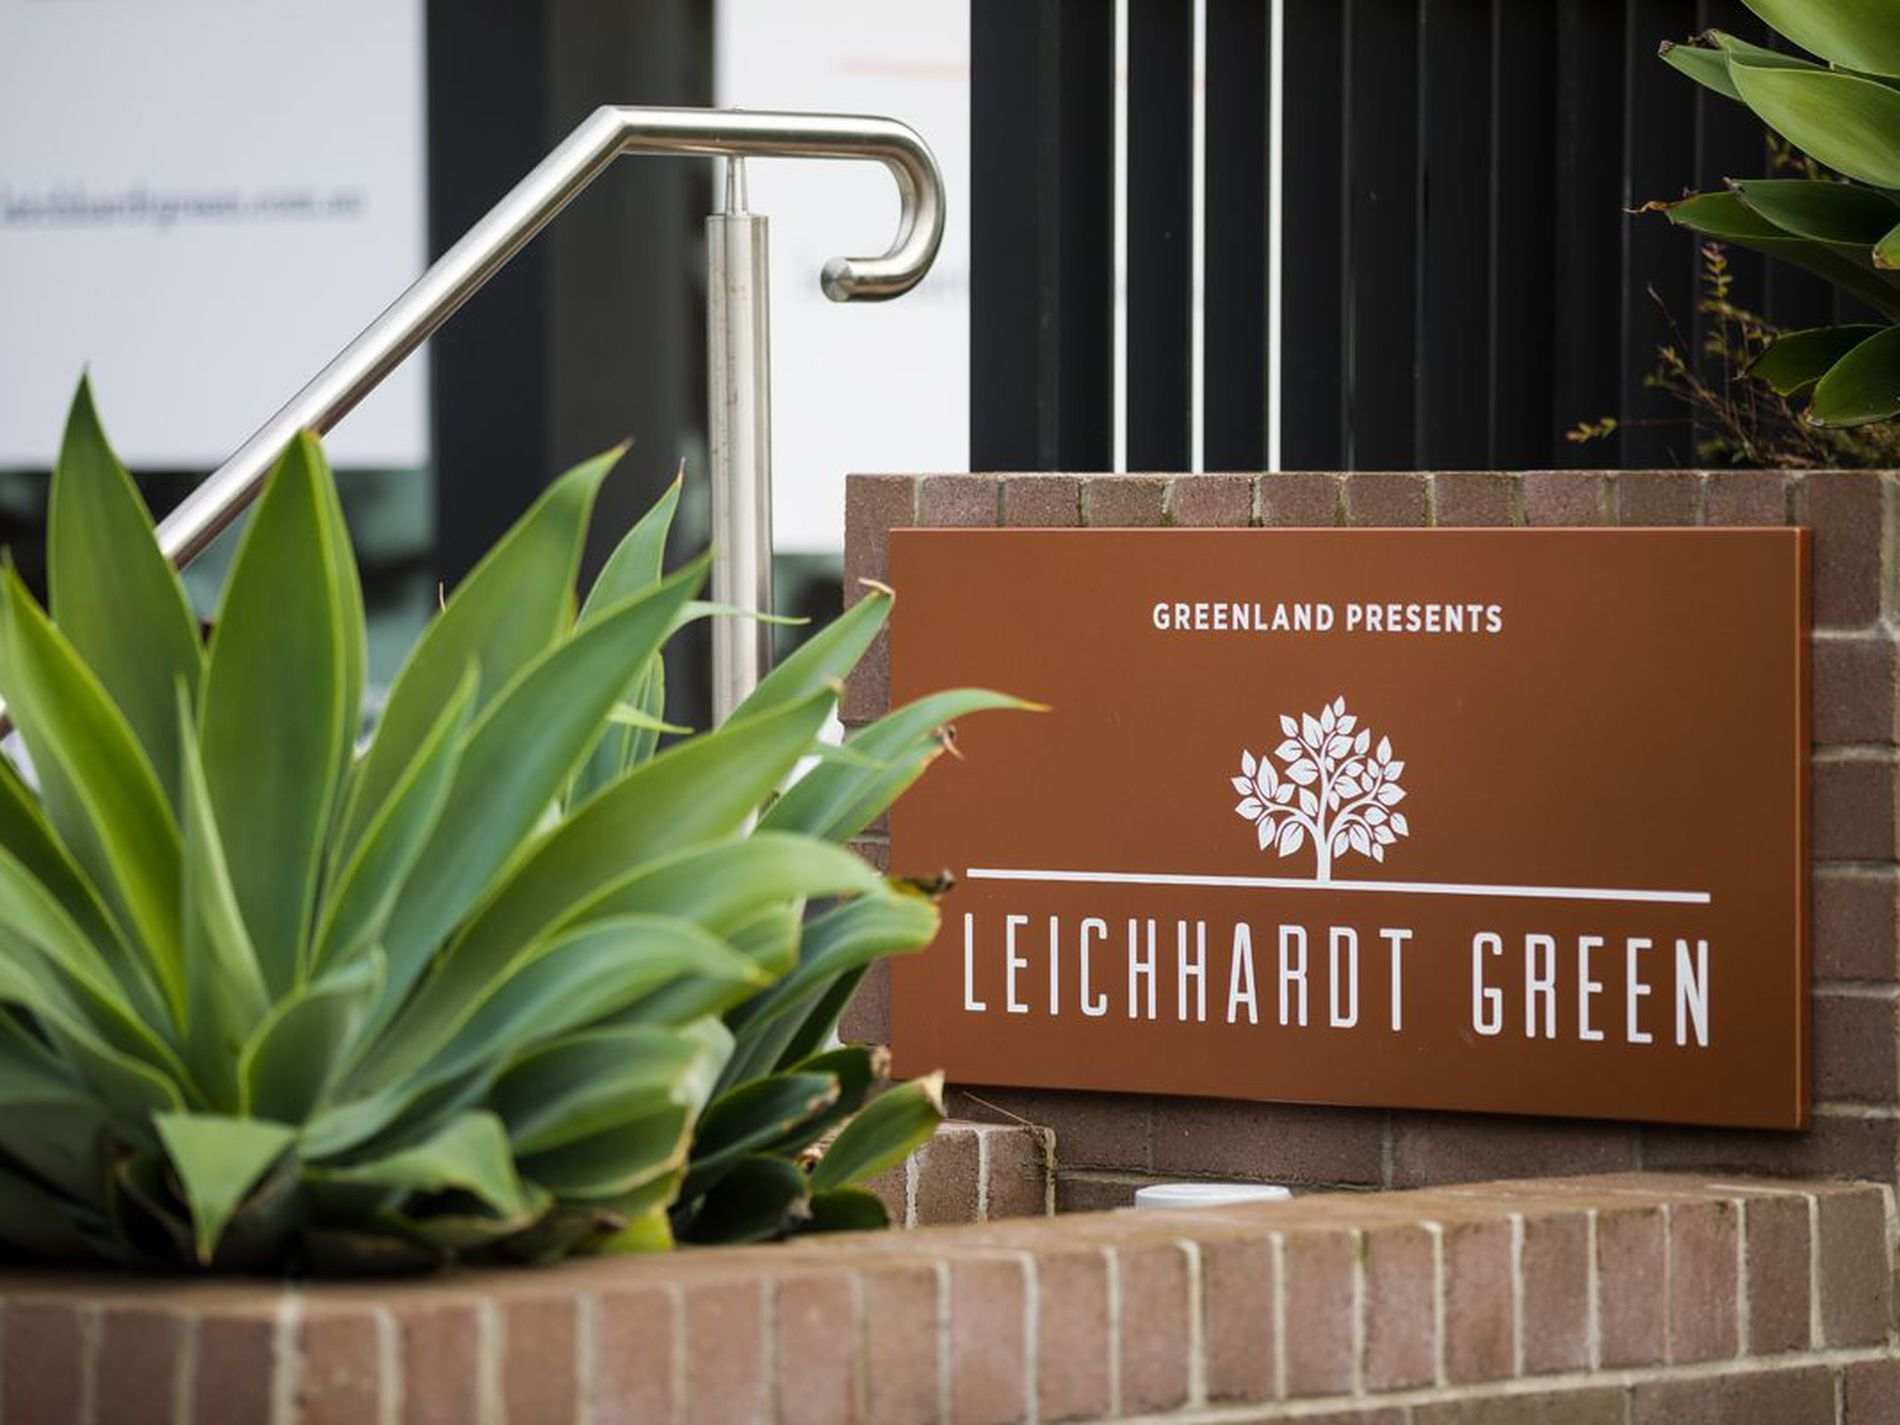 Leichhardt Green